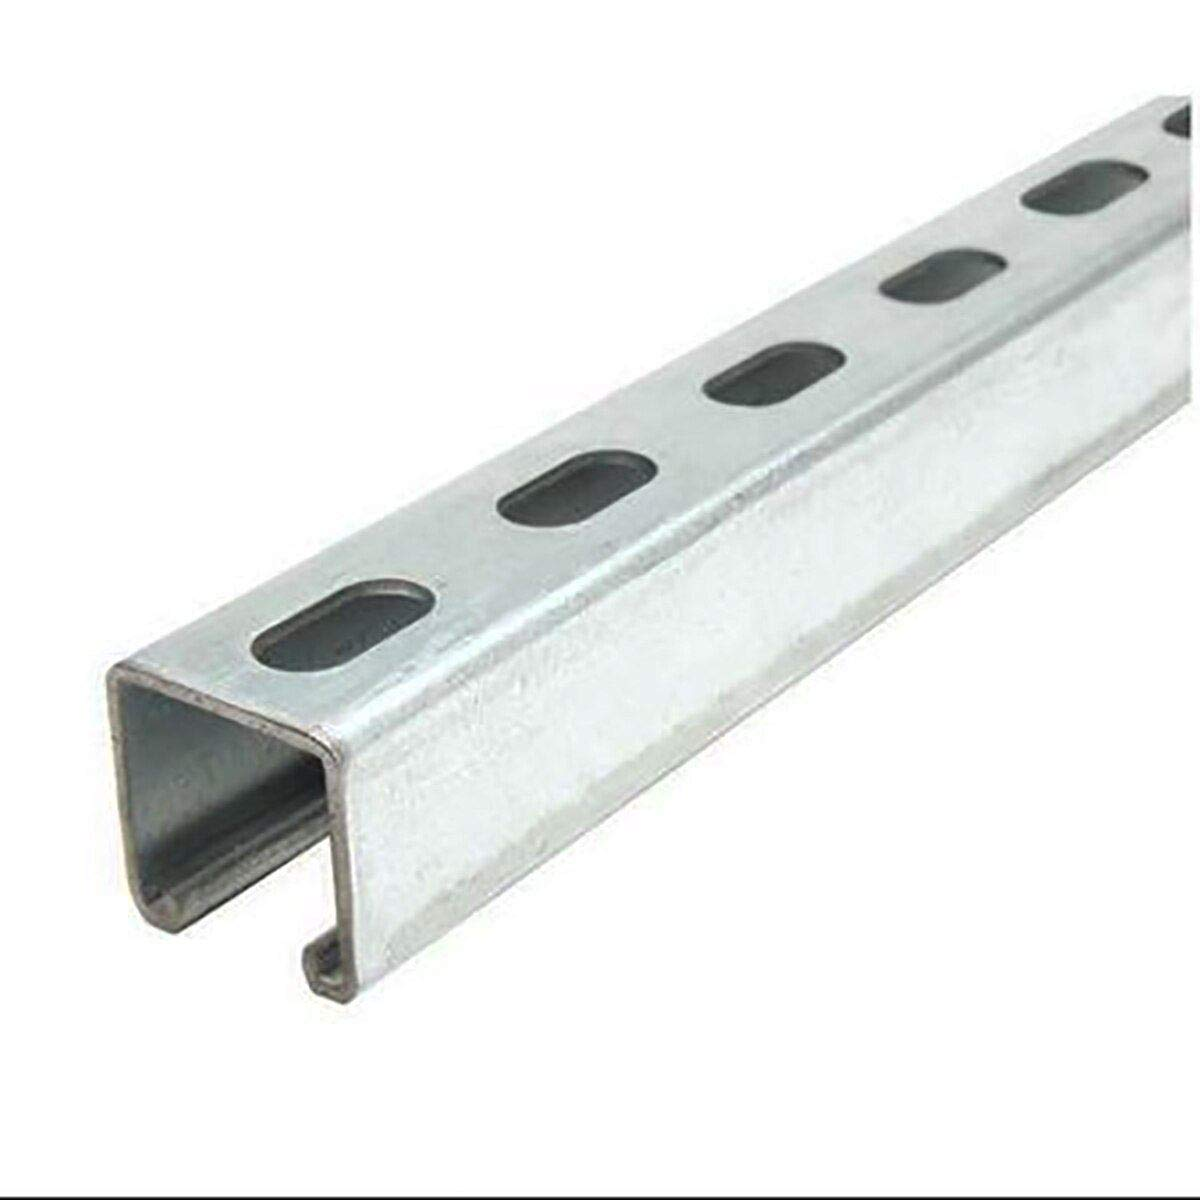 0.105 inch x 24 inches Online Metal Supply Galvanized Steel Half Slotted Strut Channel 1-5//8 x 1-5//8 x 12 ga.